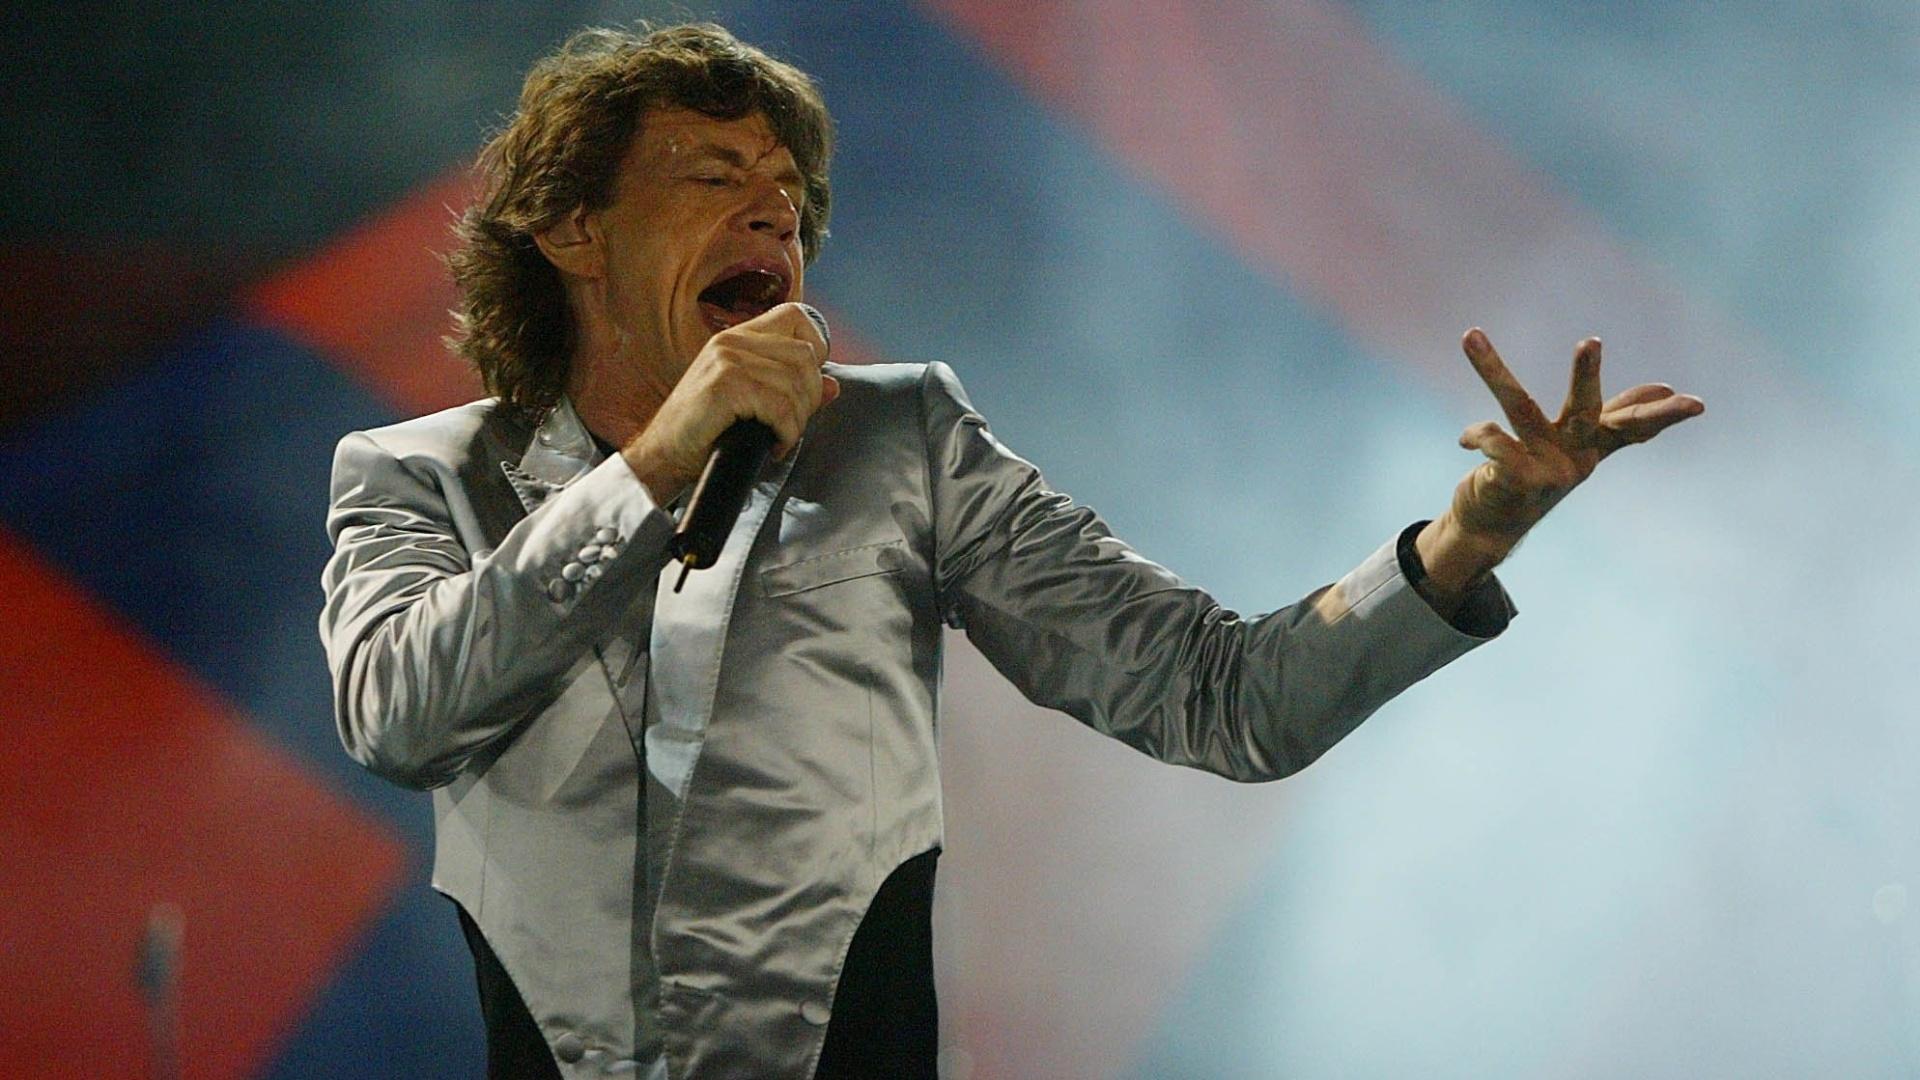 18.fev.2006 - Mick Jagger, vocalista dos Rolling Stones, durante show da turnê